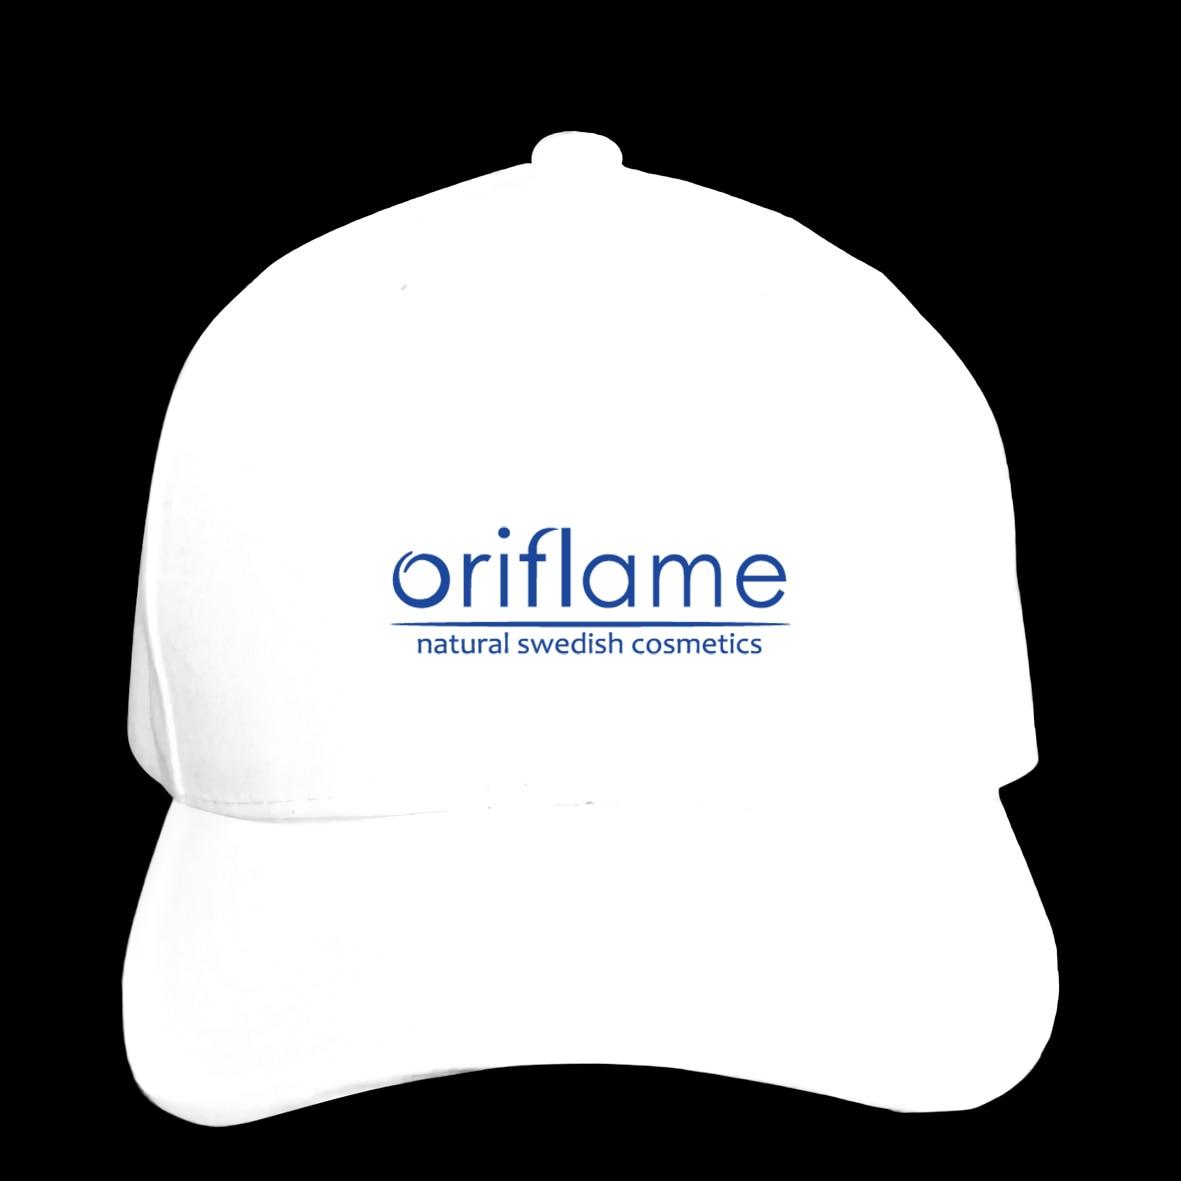 Бейсбол Кепки Oriflame логотип шляпа с остроконечным Кепки